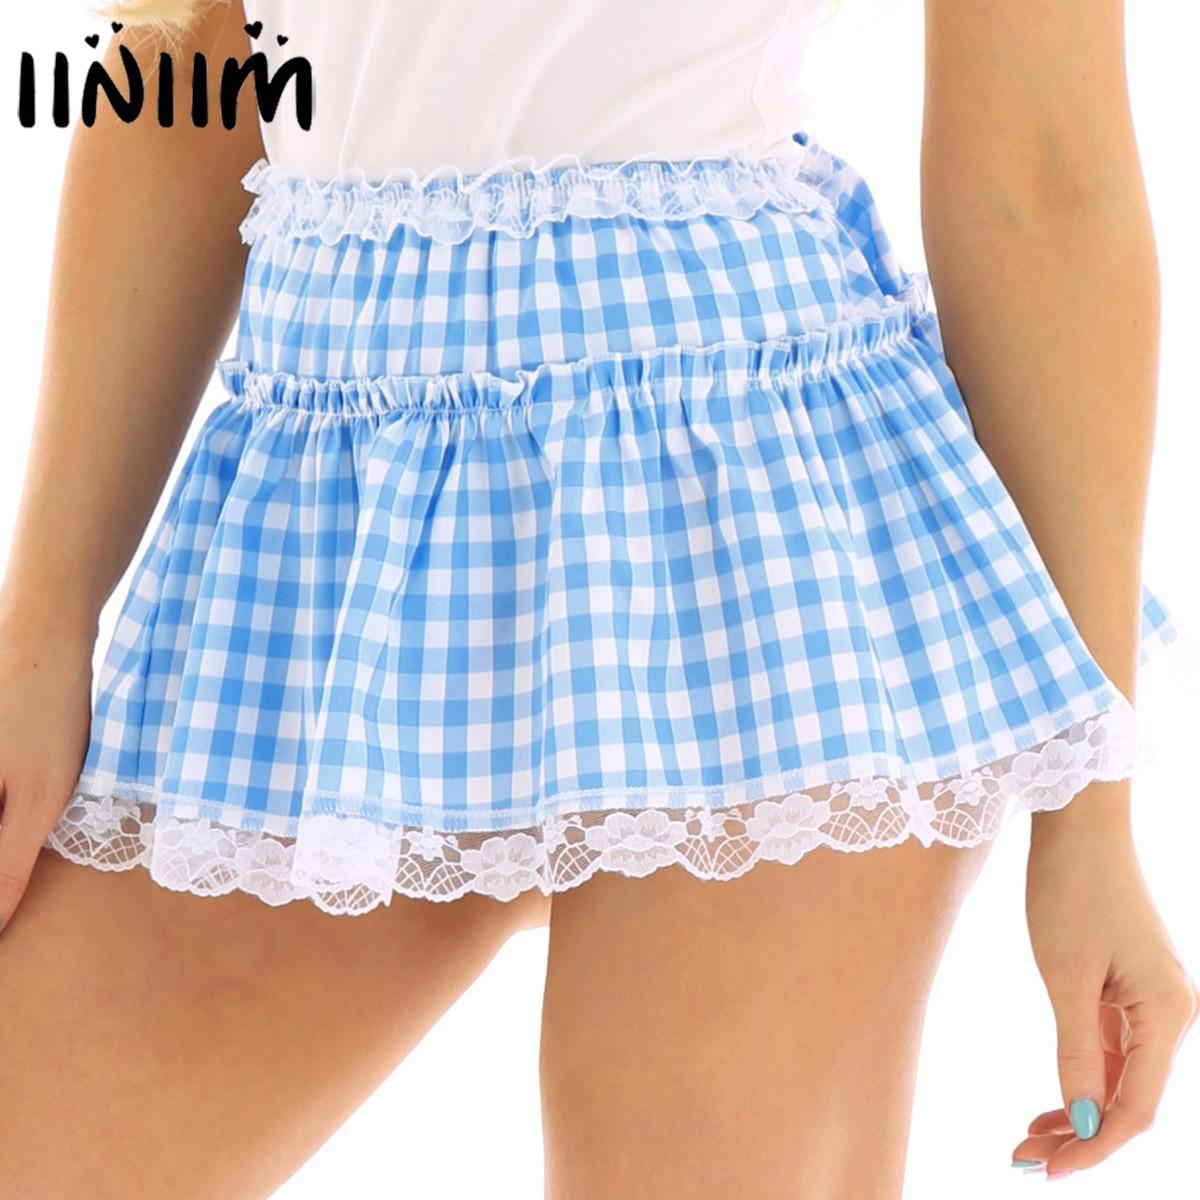 Men Women Sexy Clubwear Costume Dance Skirts Elastic Waistband Short Skirt With Lace Hem Pleated Gingham A-line Mini Skirt